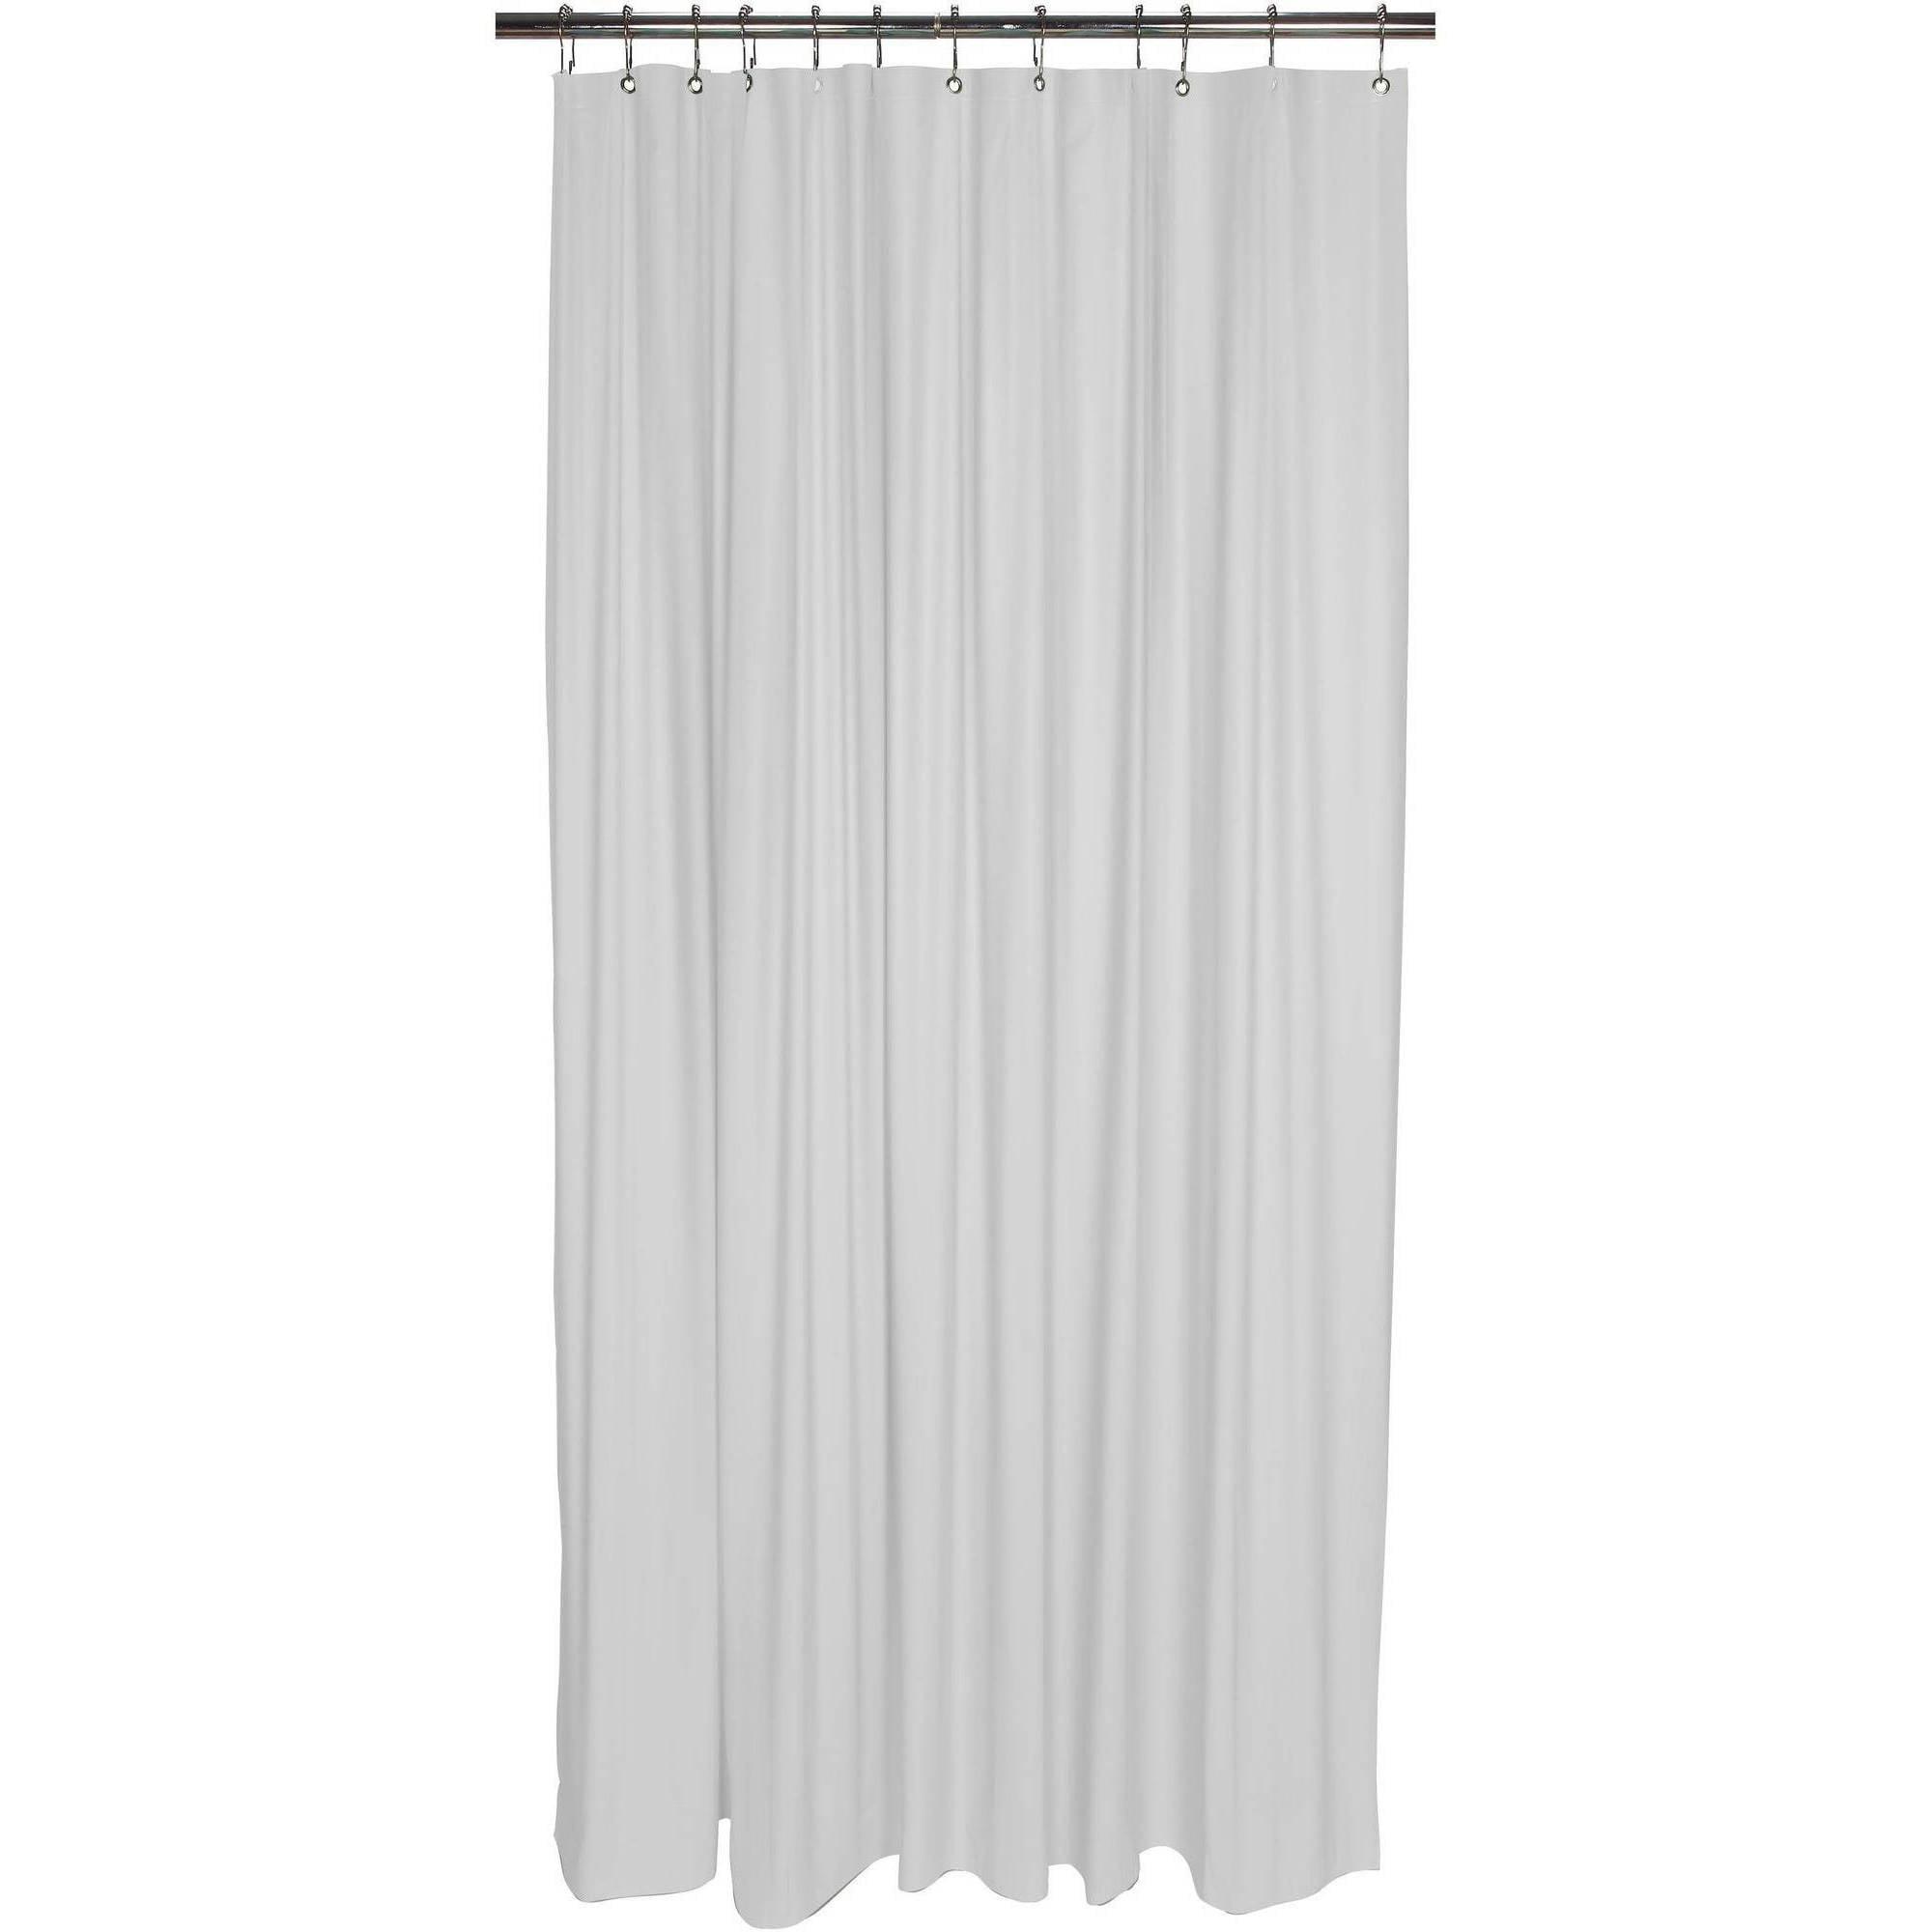 Bath Bliss Shower Liner - Frost Clear - Walmart.com